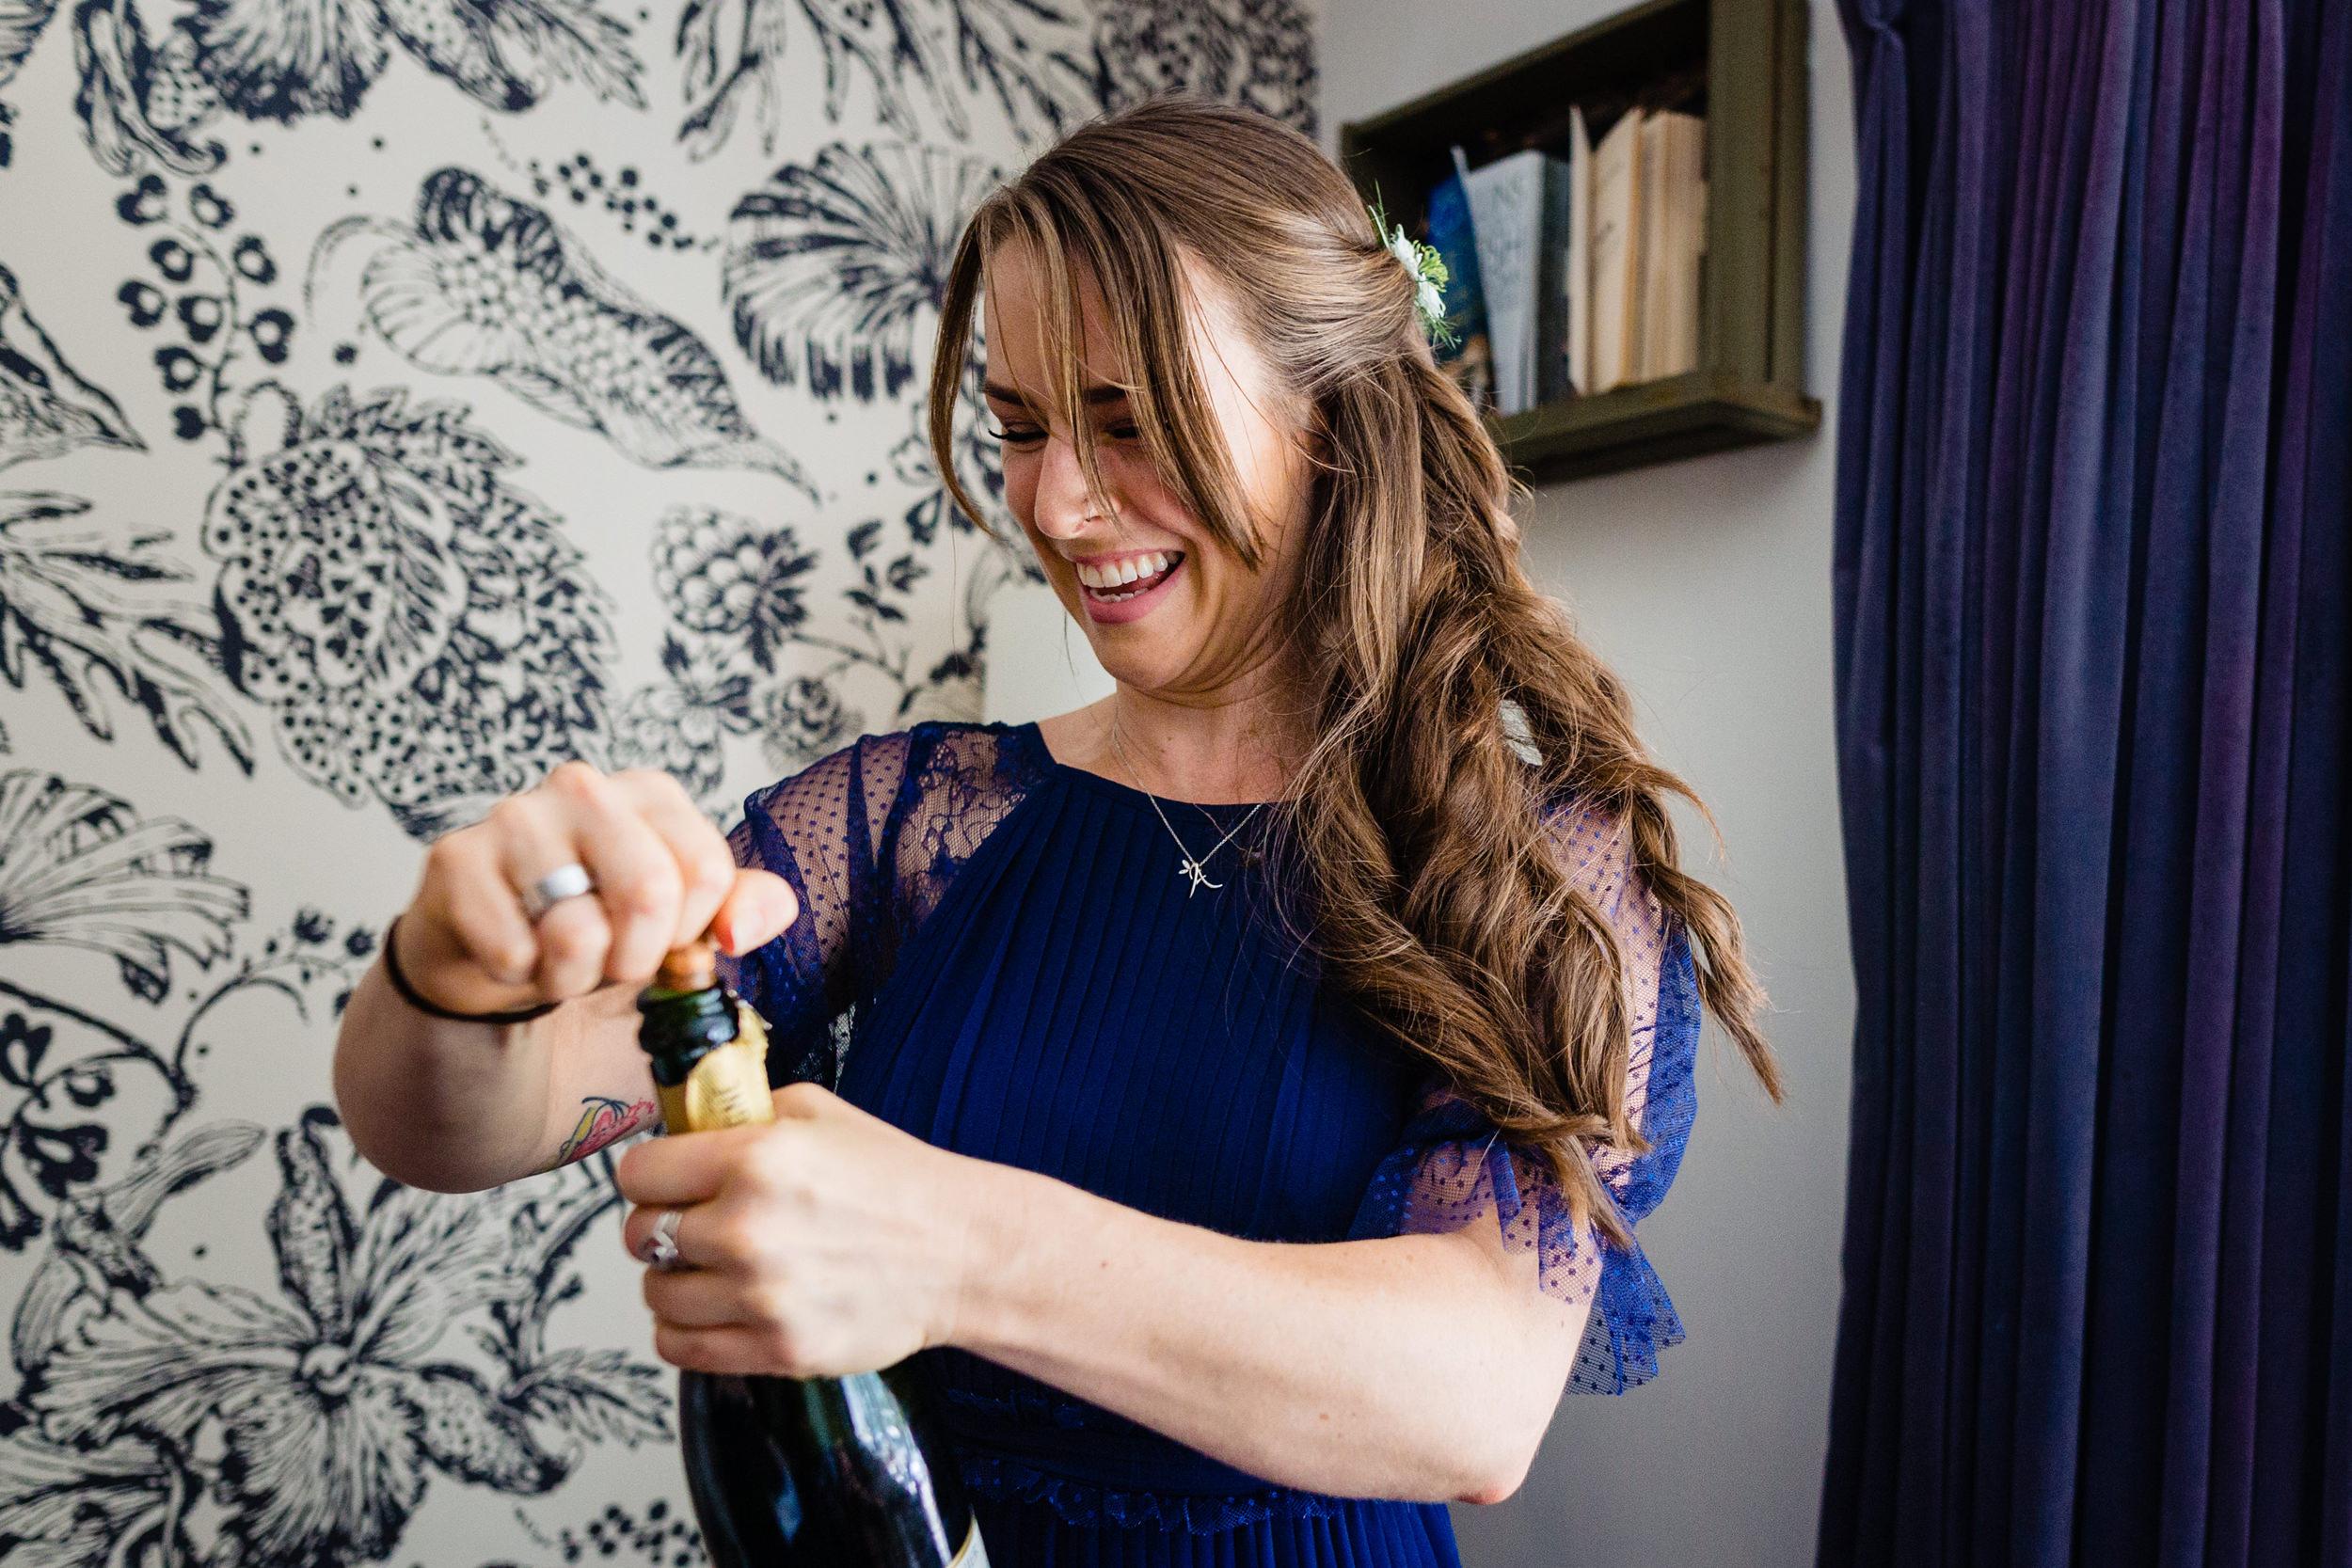 bridesmaid uncorking champagne. maybush wedding co wedding photography by emma and rich.